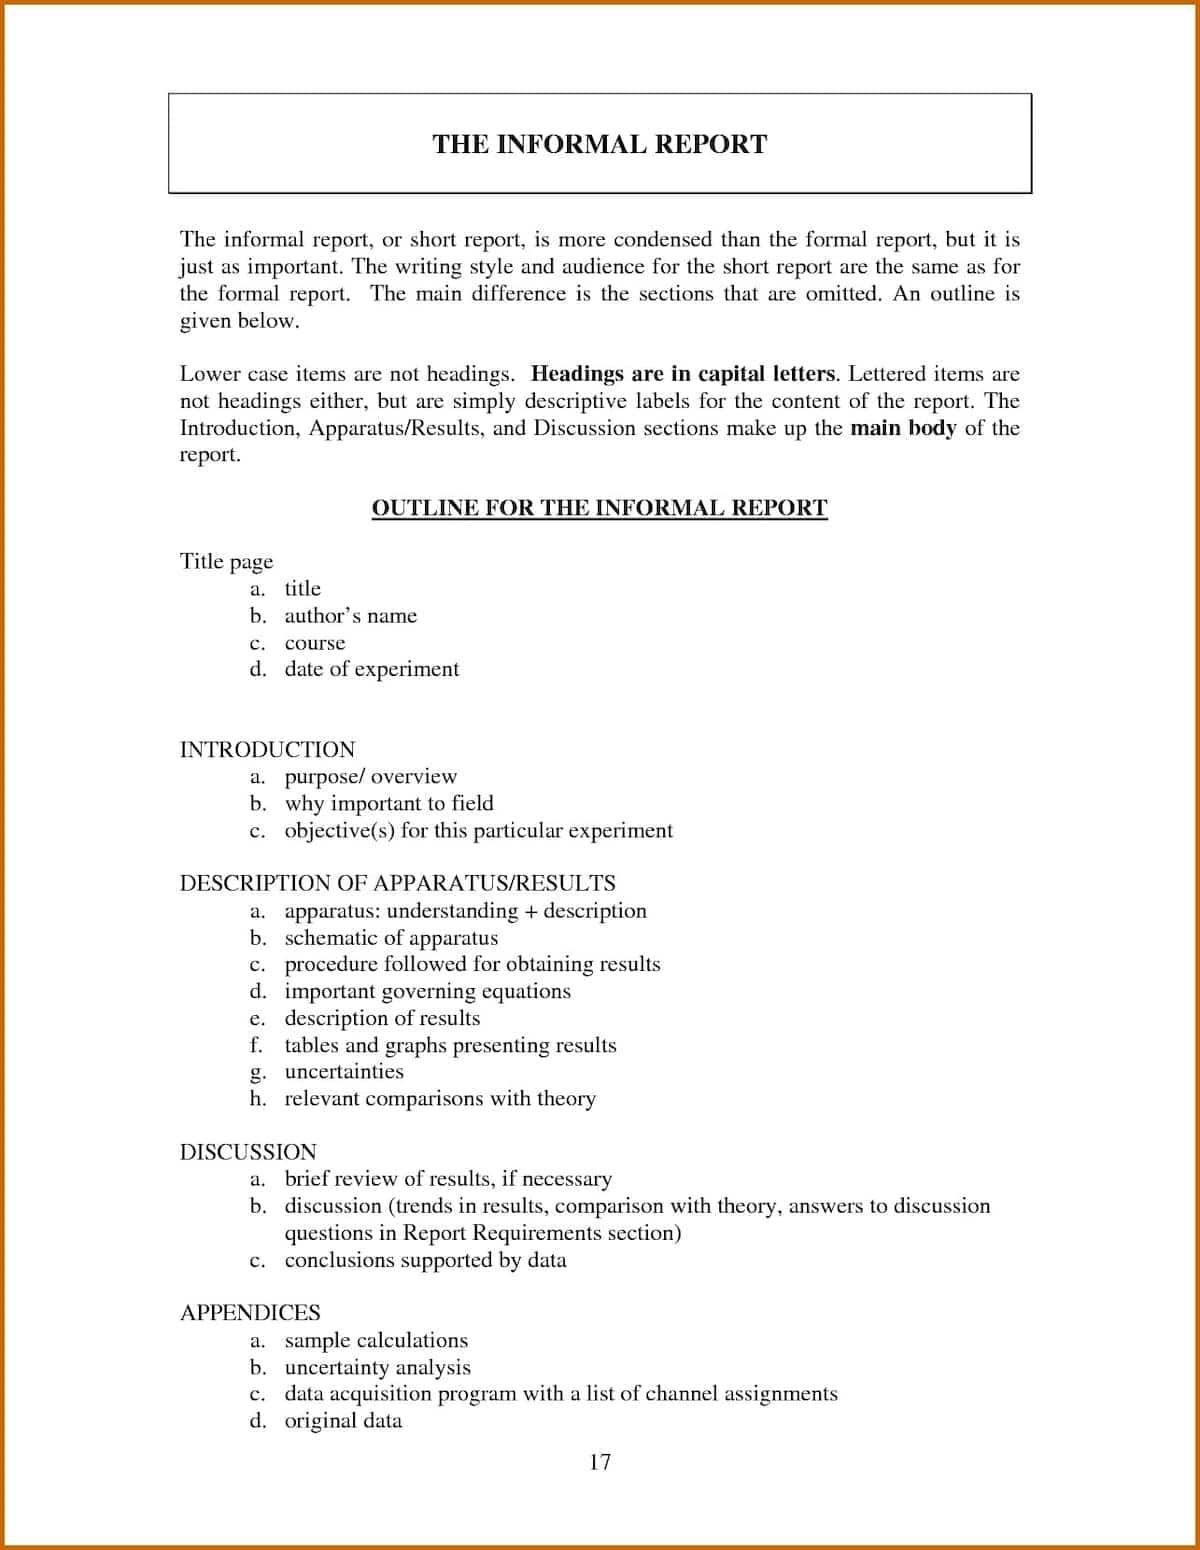 how to write a report, how to write a report format, report format